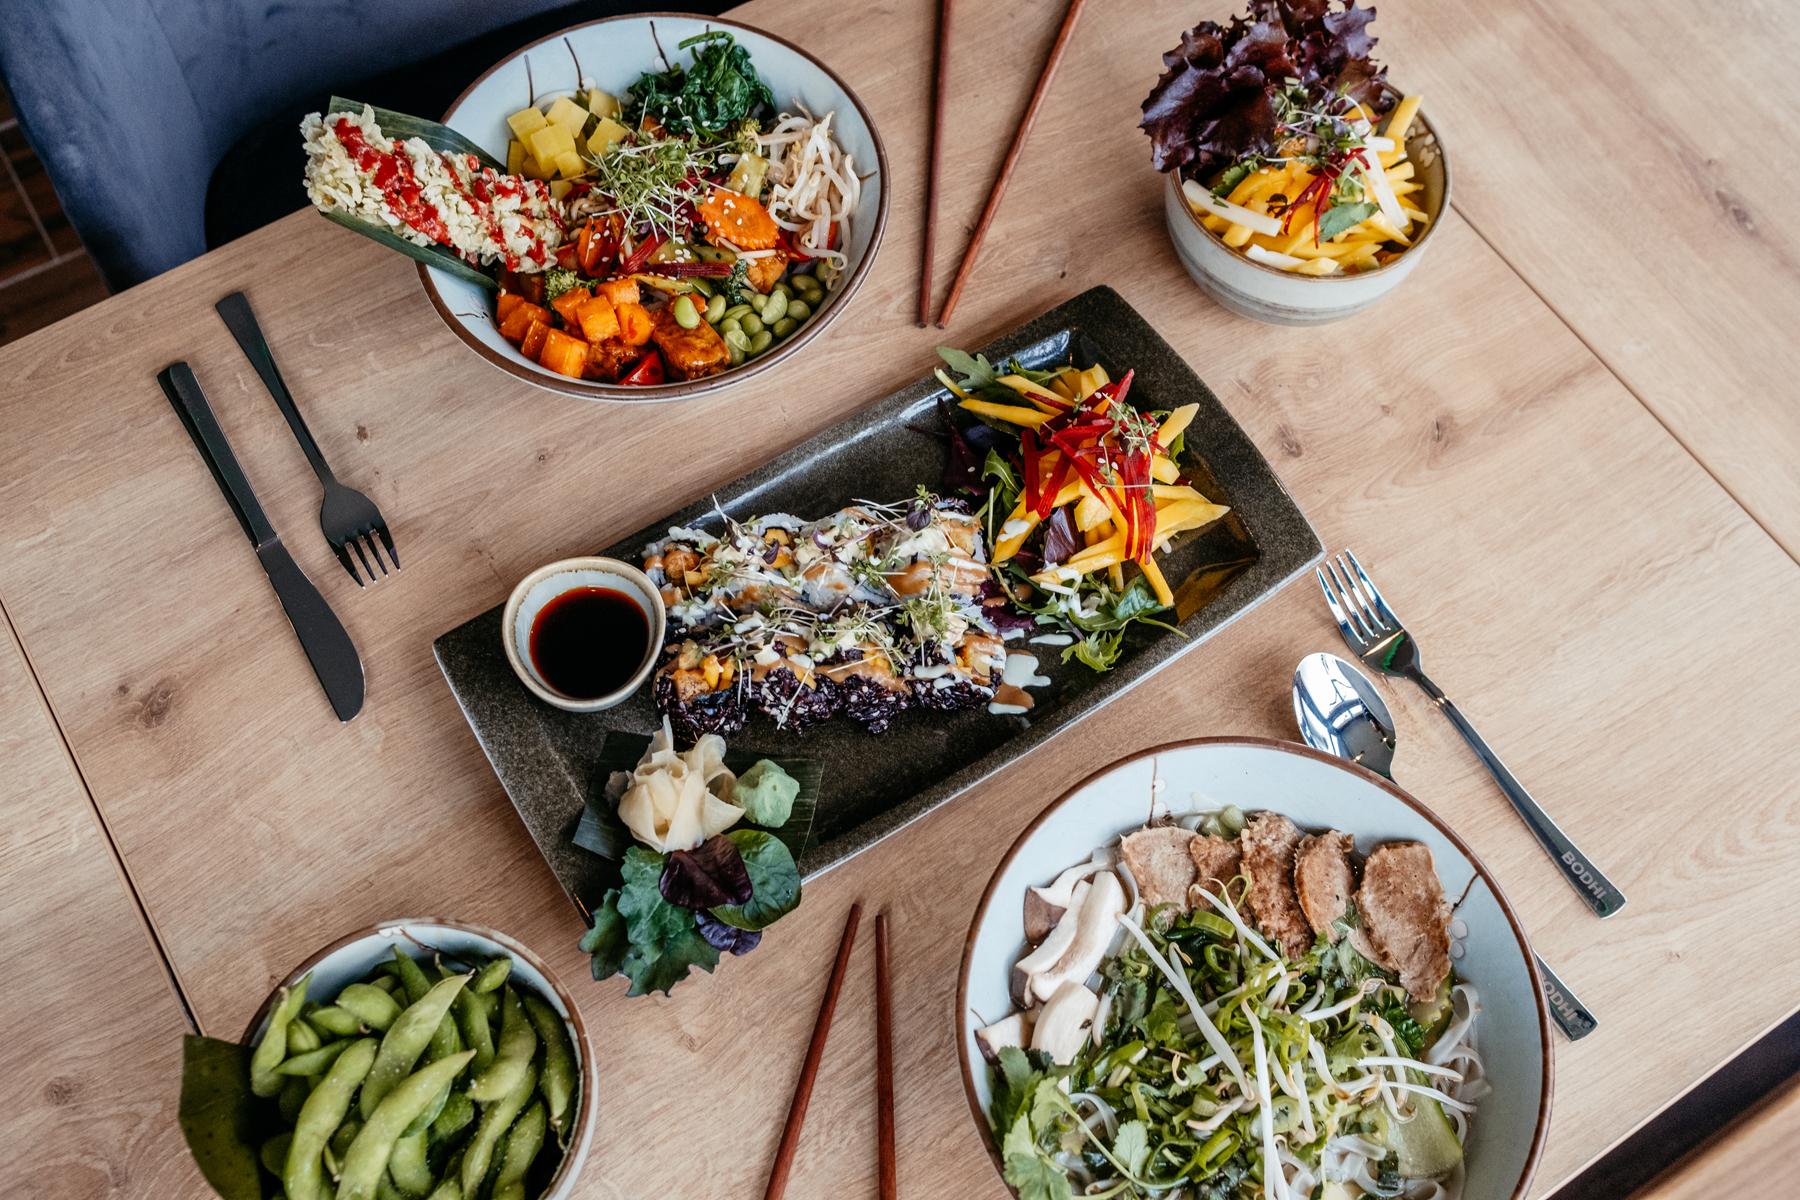 Geheimtipp Hamburg Winterhude Restaurant Bodhi vegan living Dahlina Sophie Kock 28